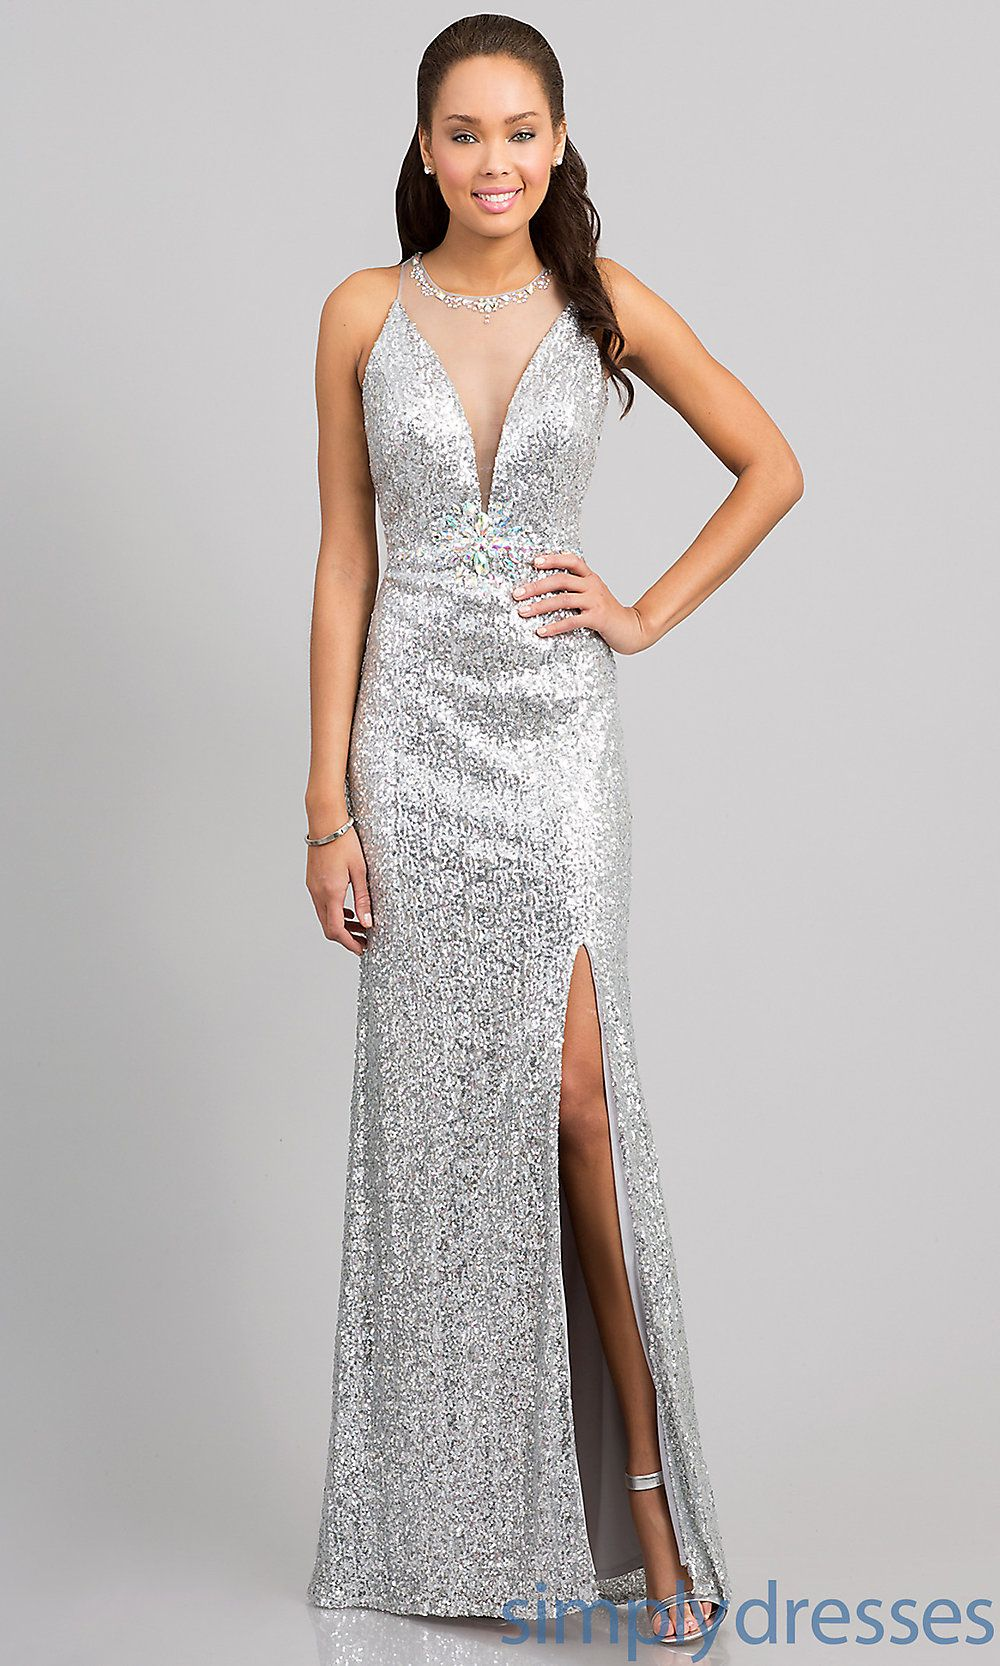 Dress floor length sleeveless sequin dress simply